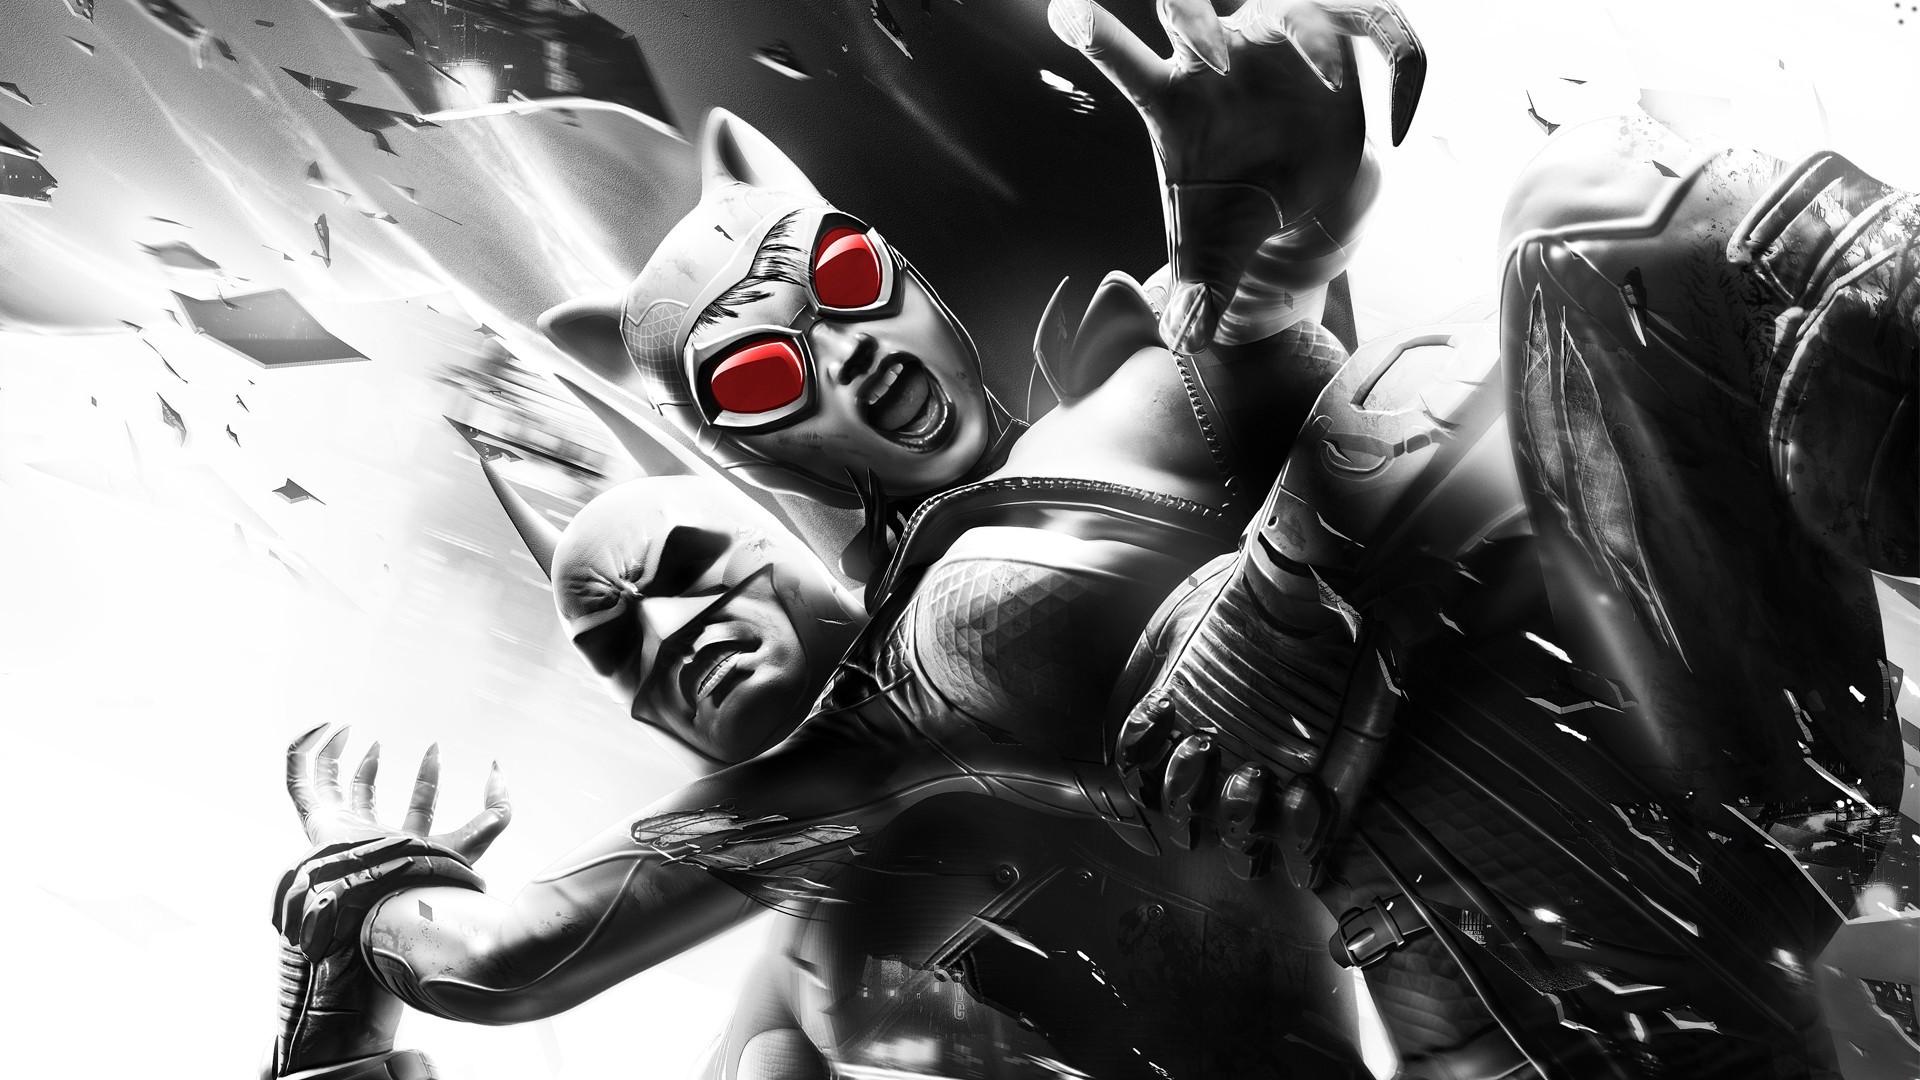 Video Games Monochrome Batman Arkham City Catwoman Joker Harley Quinn Comics Clothing The Riddler Rocksteady